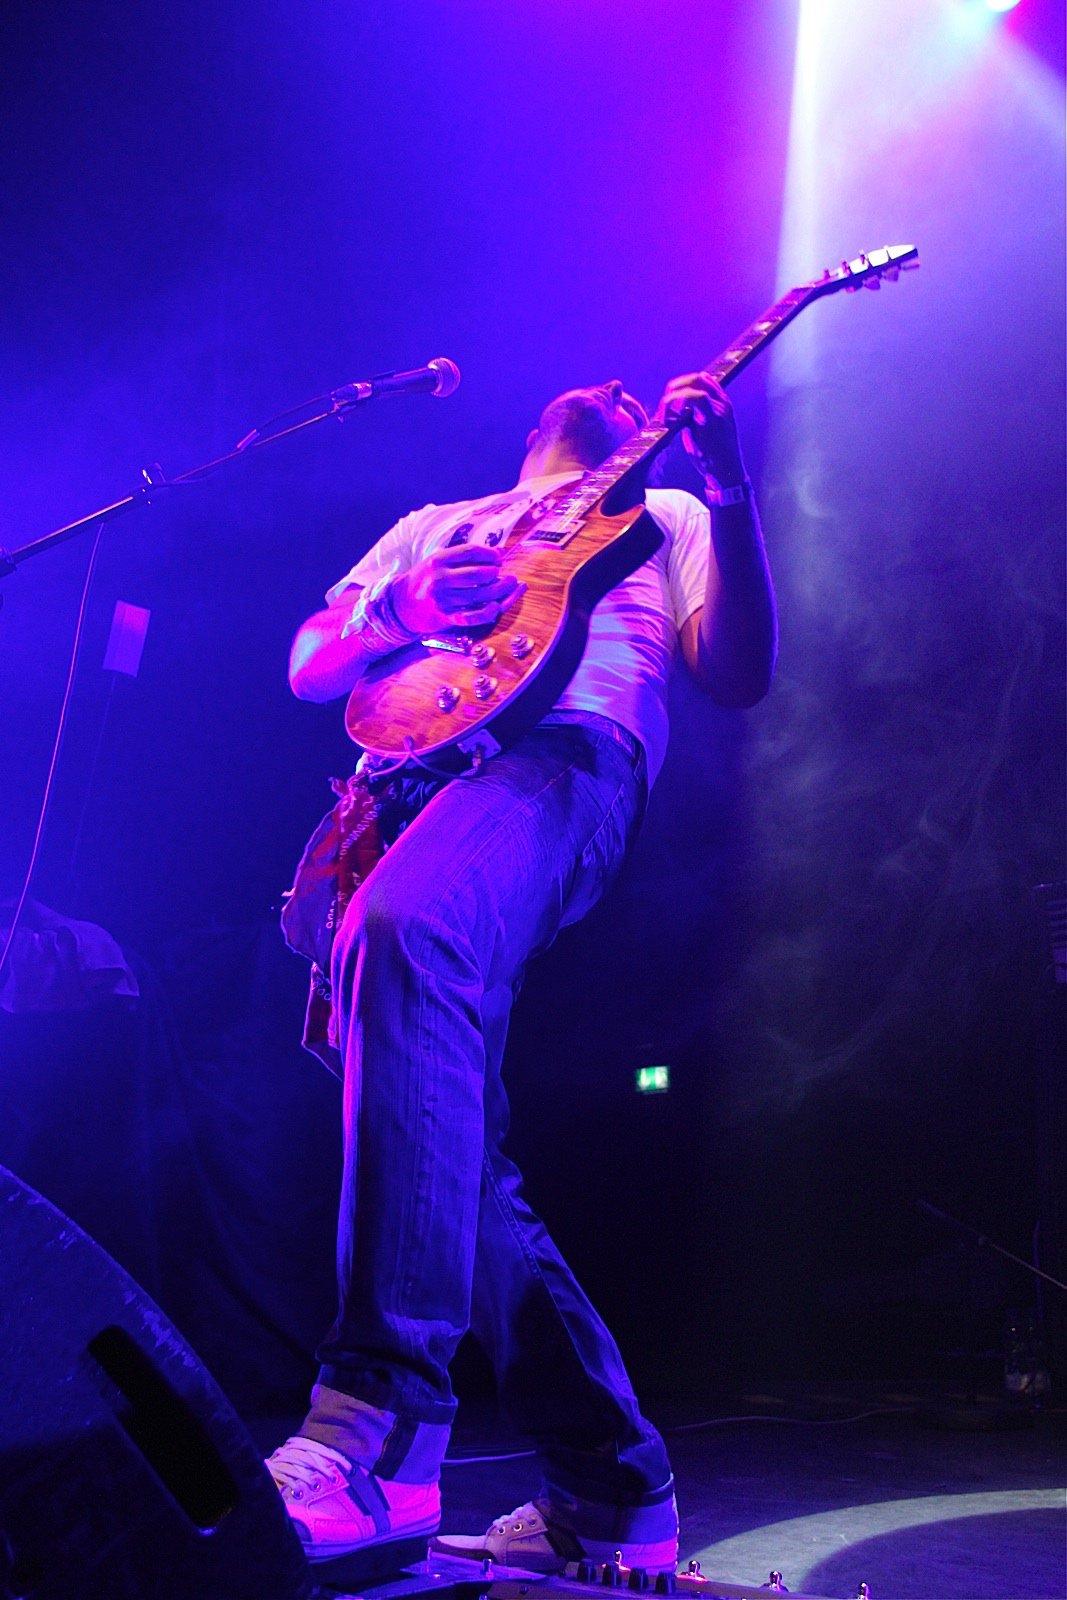 An Assfull Of Love - Rockhal Esch-sur-Alzette, 19.11.2011 (Support für J.B.O.) - Foto von Andrea Jaeckel-Dobschat - 016